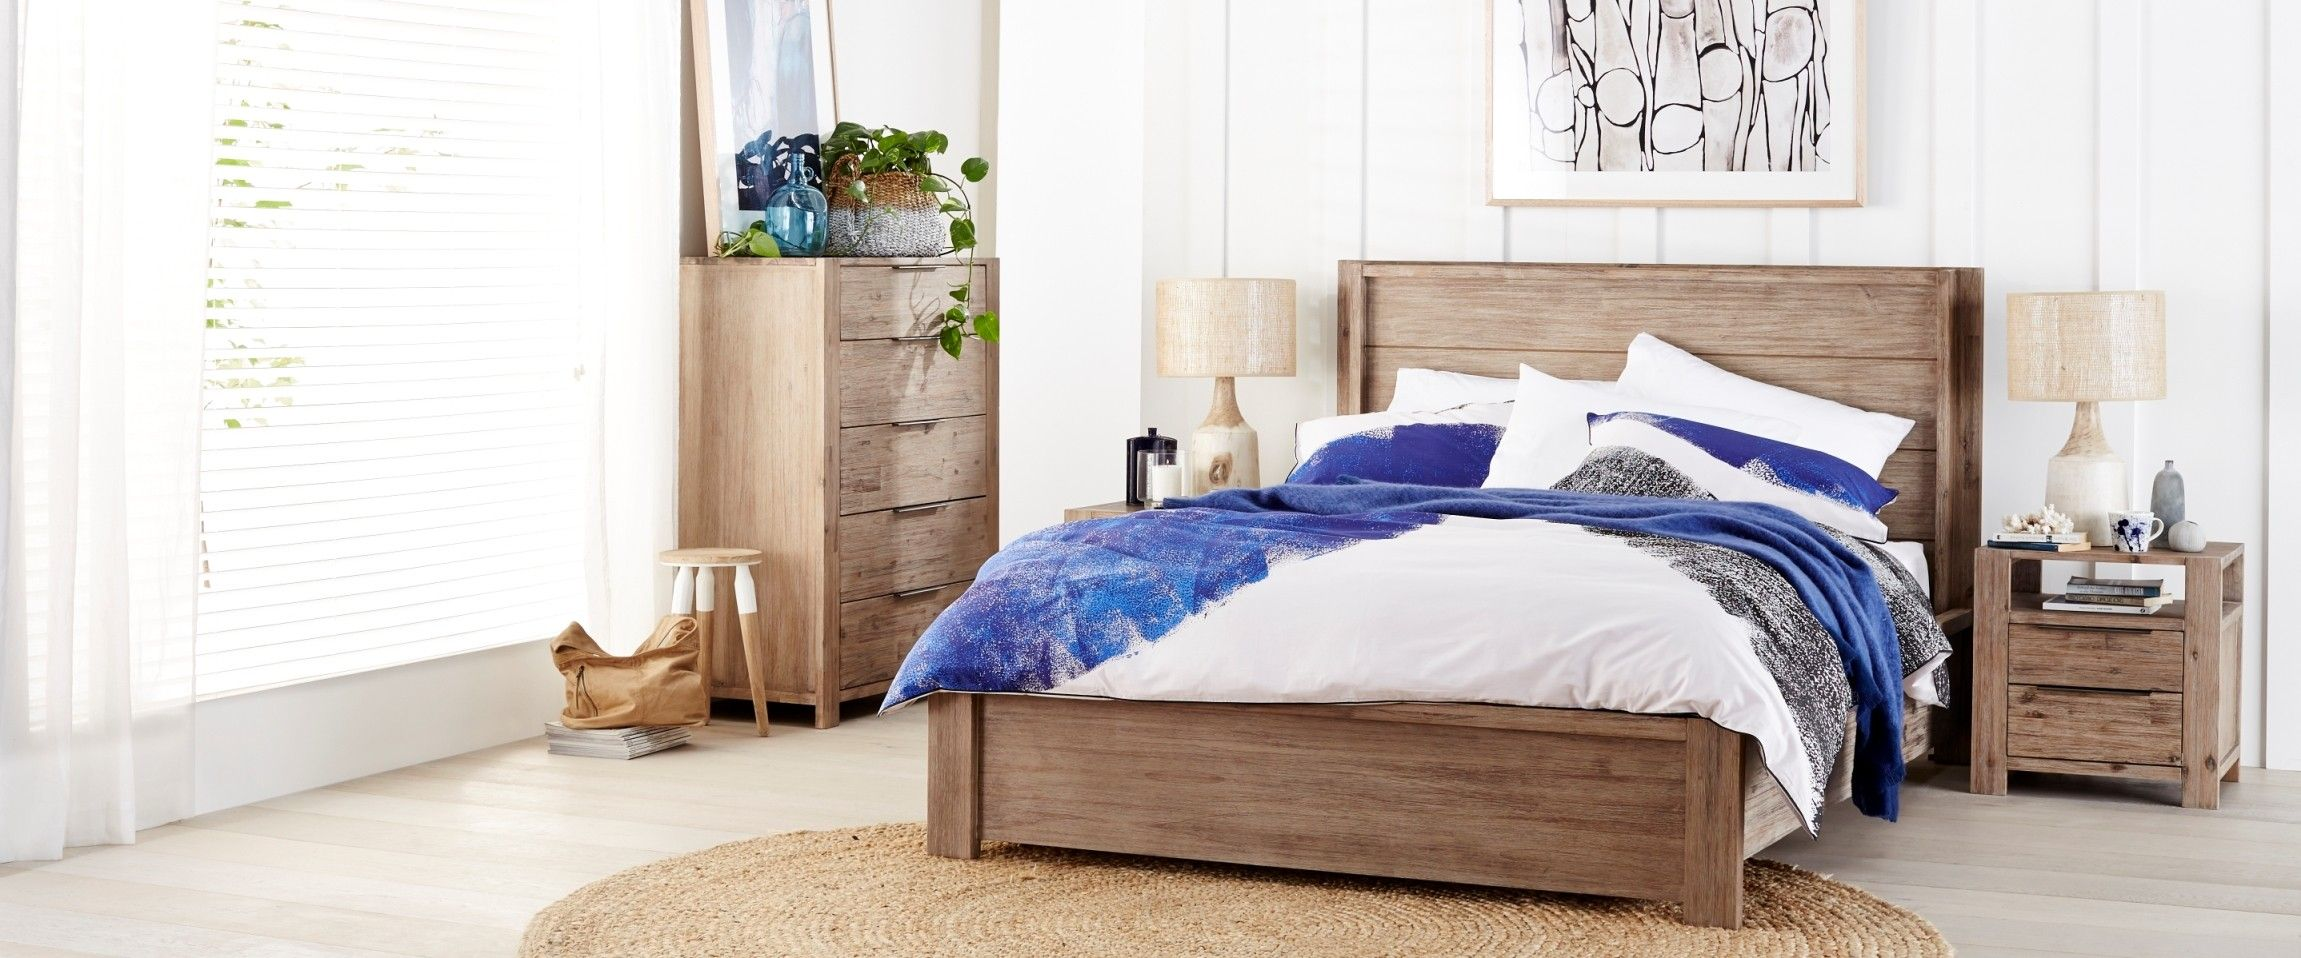 Montego bedroom furniture the montego bedroom furniture collection